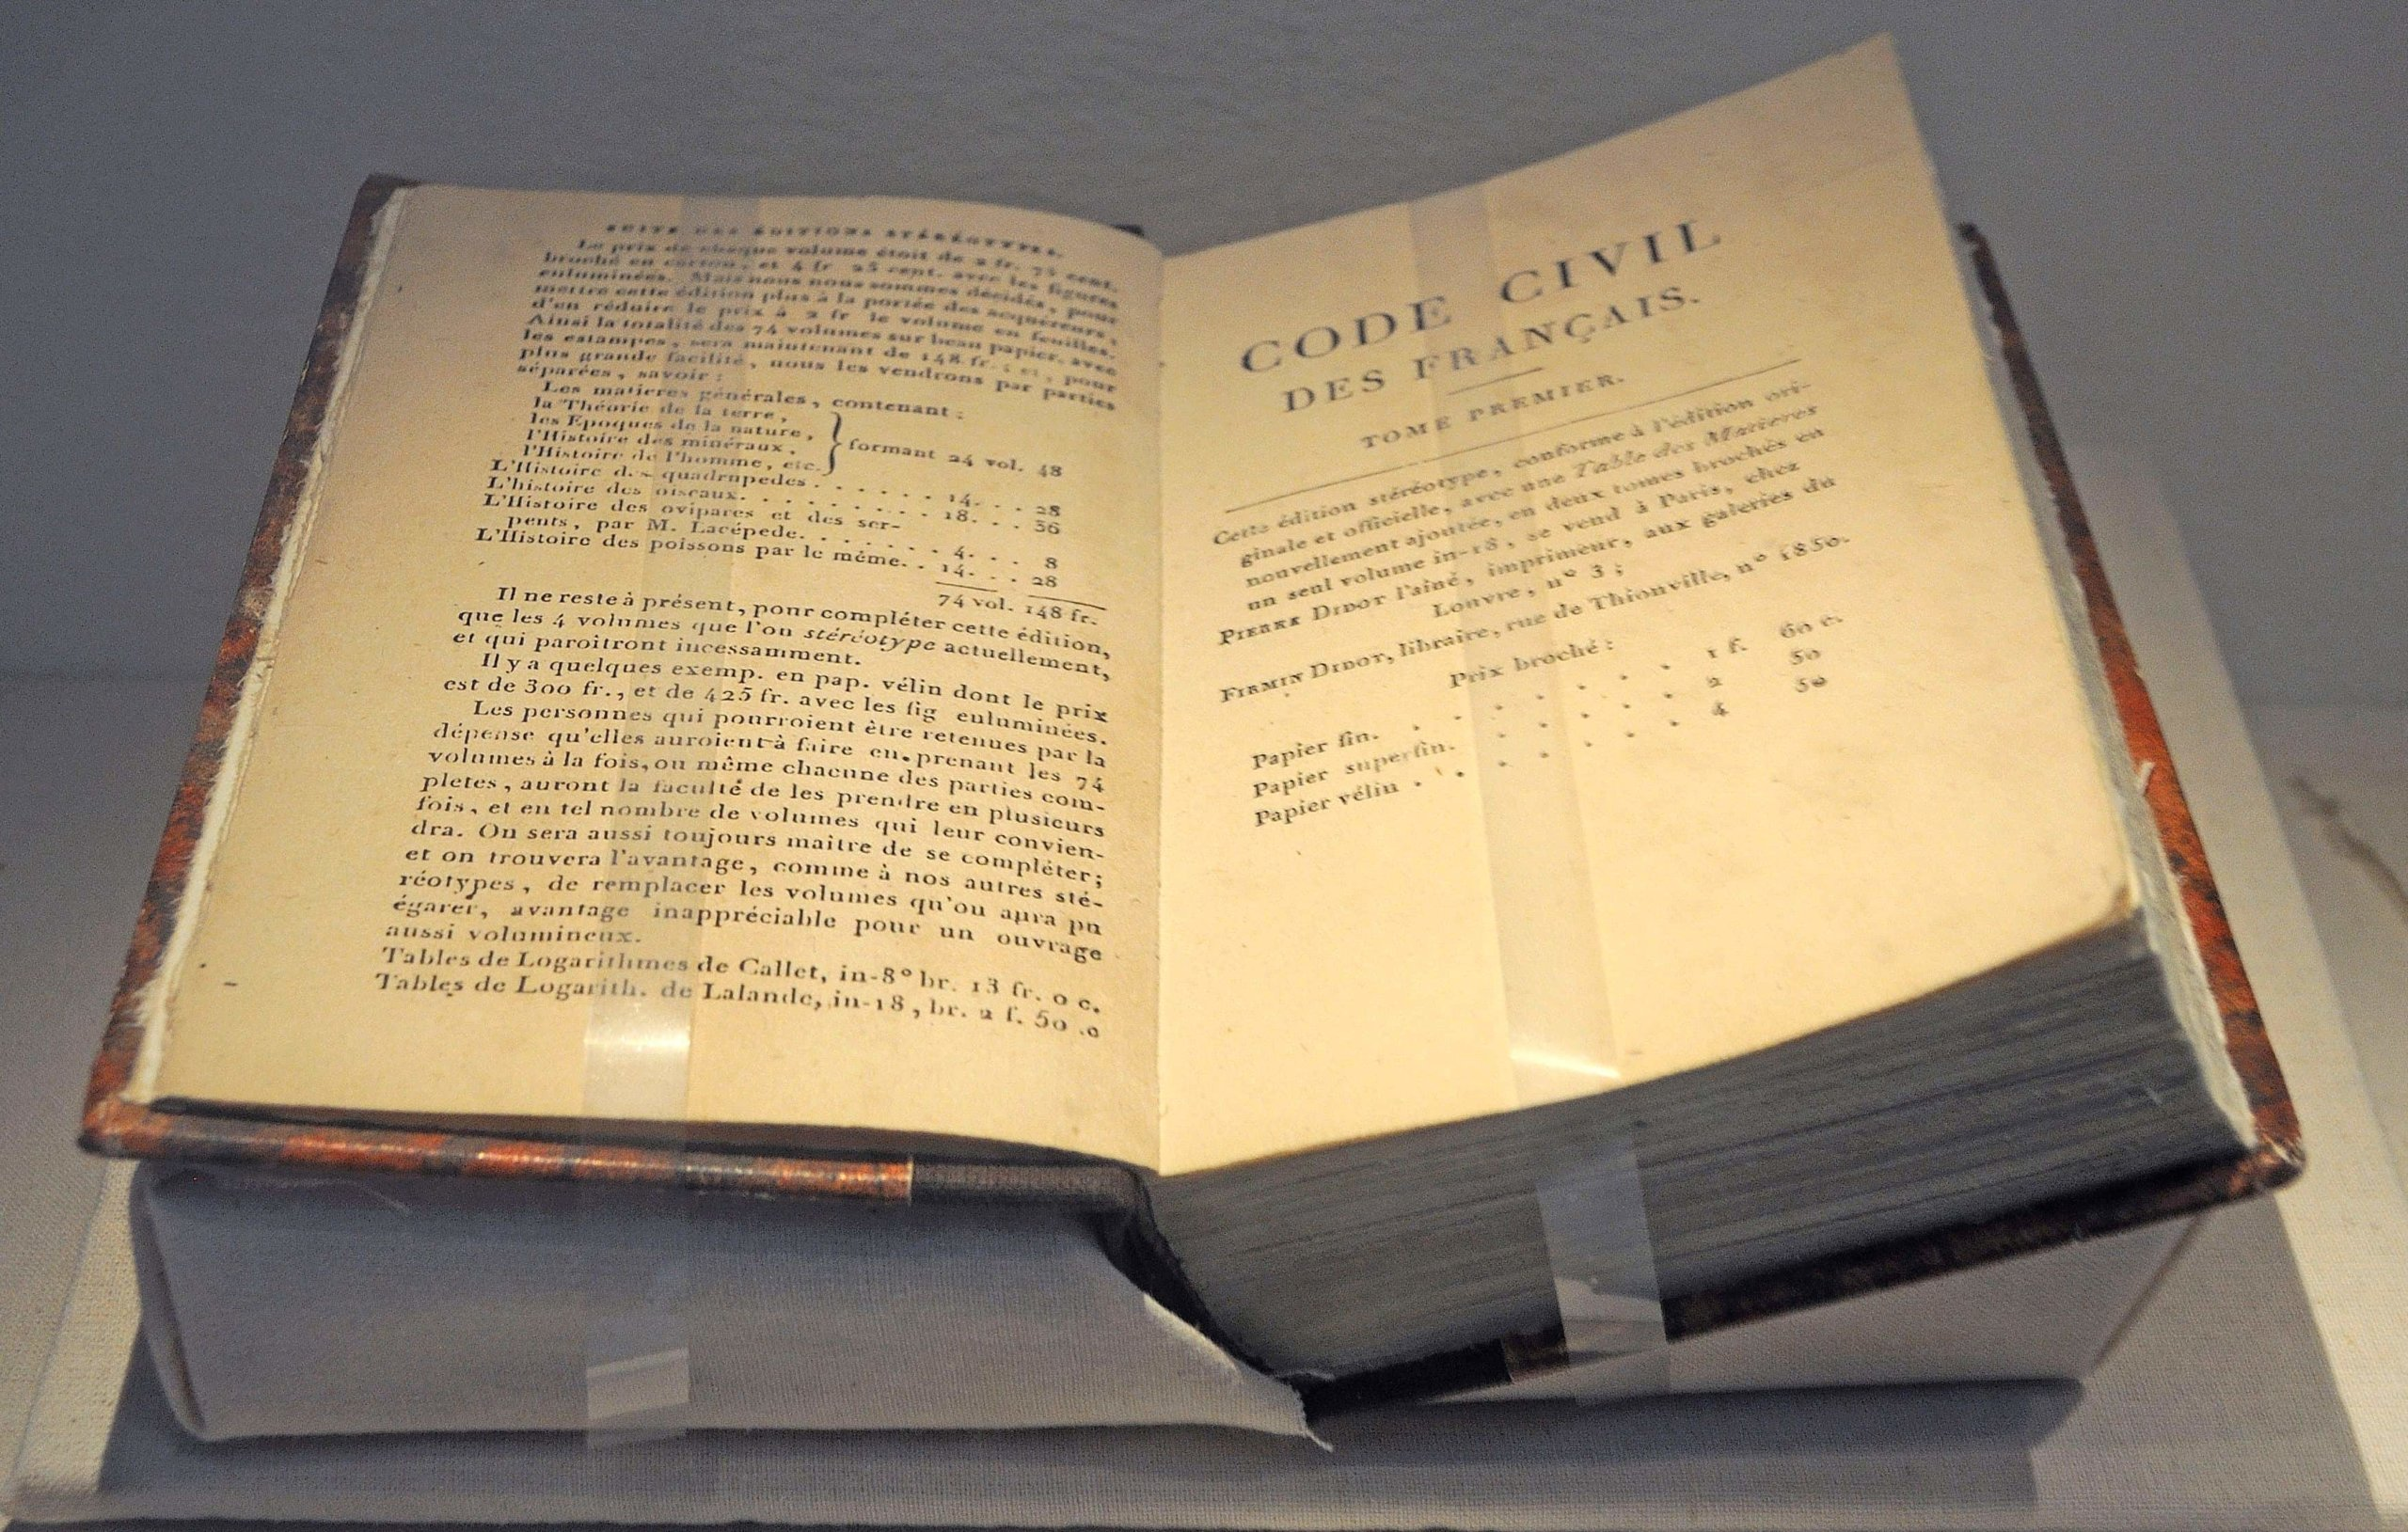 LUXEMBOURG COMMERCIAL CODE BOOK III